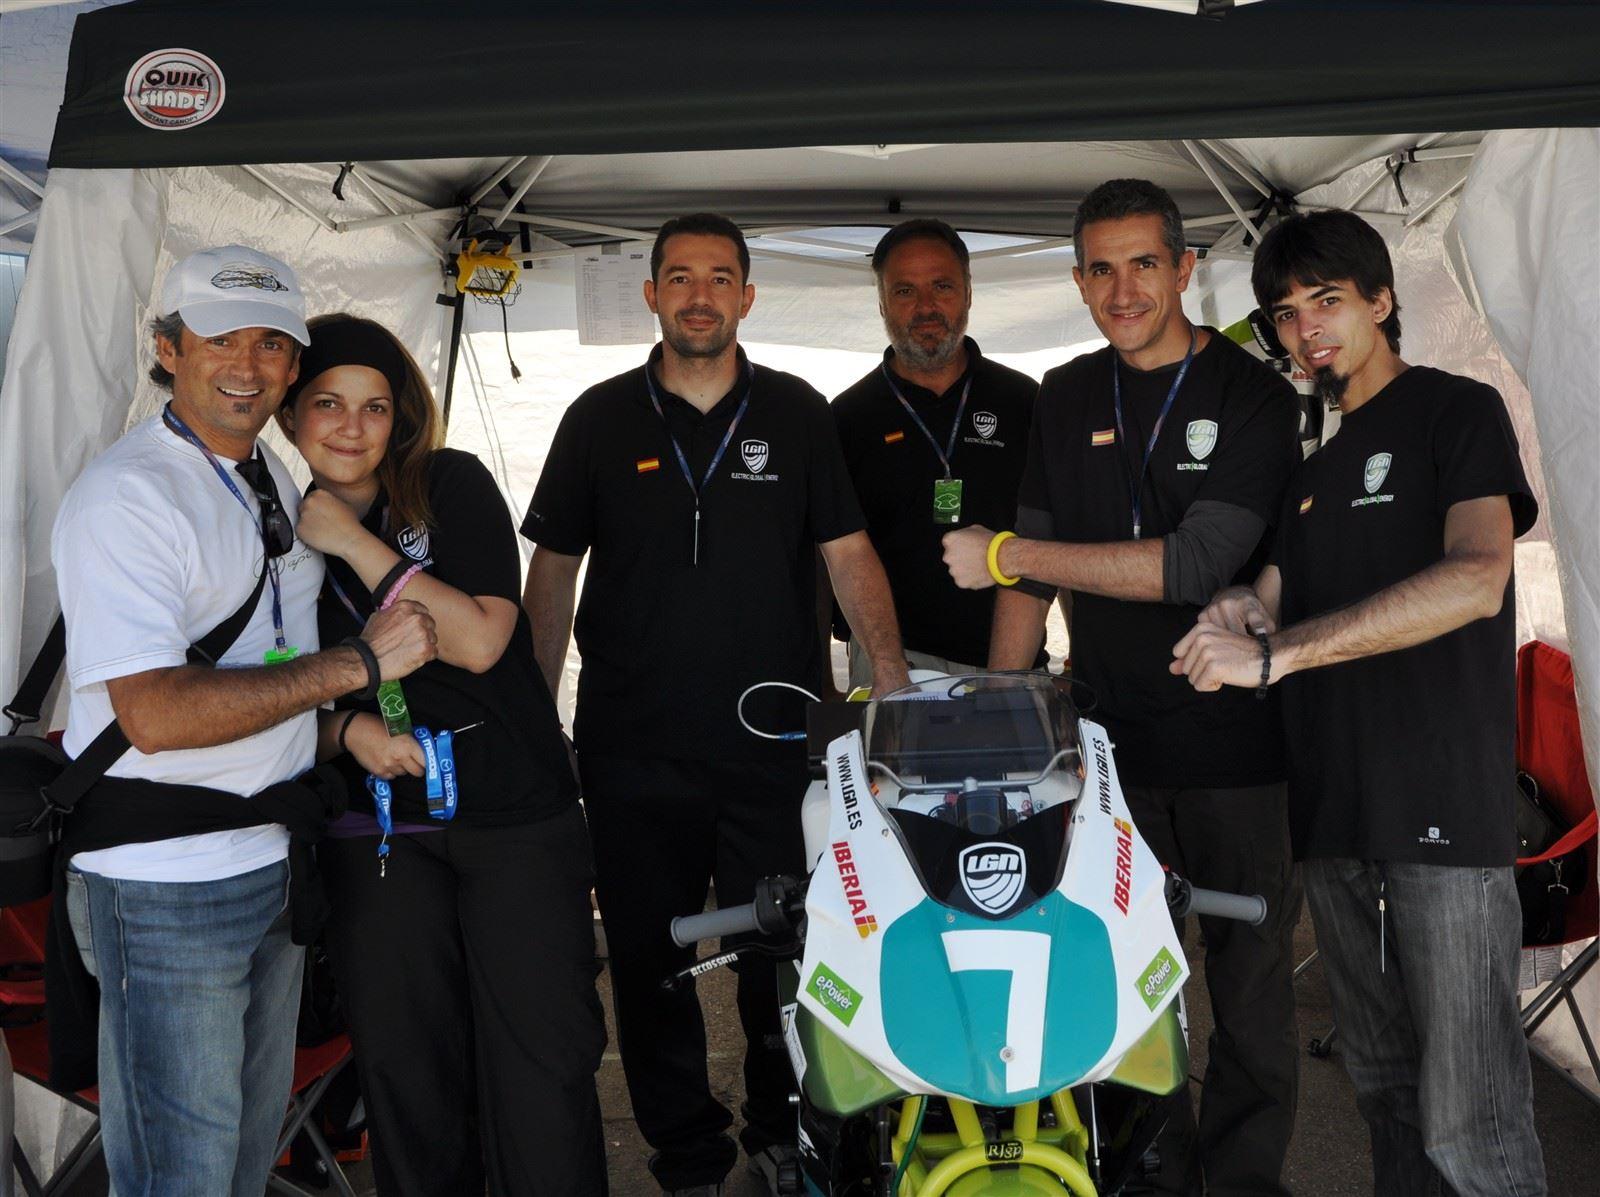 EP Deisgner Rolando Ortiz & Team LGN : Team LGN wearing EuroPapi wristbands